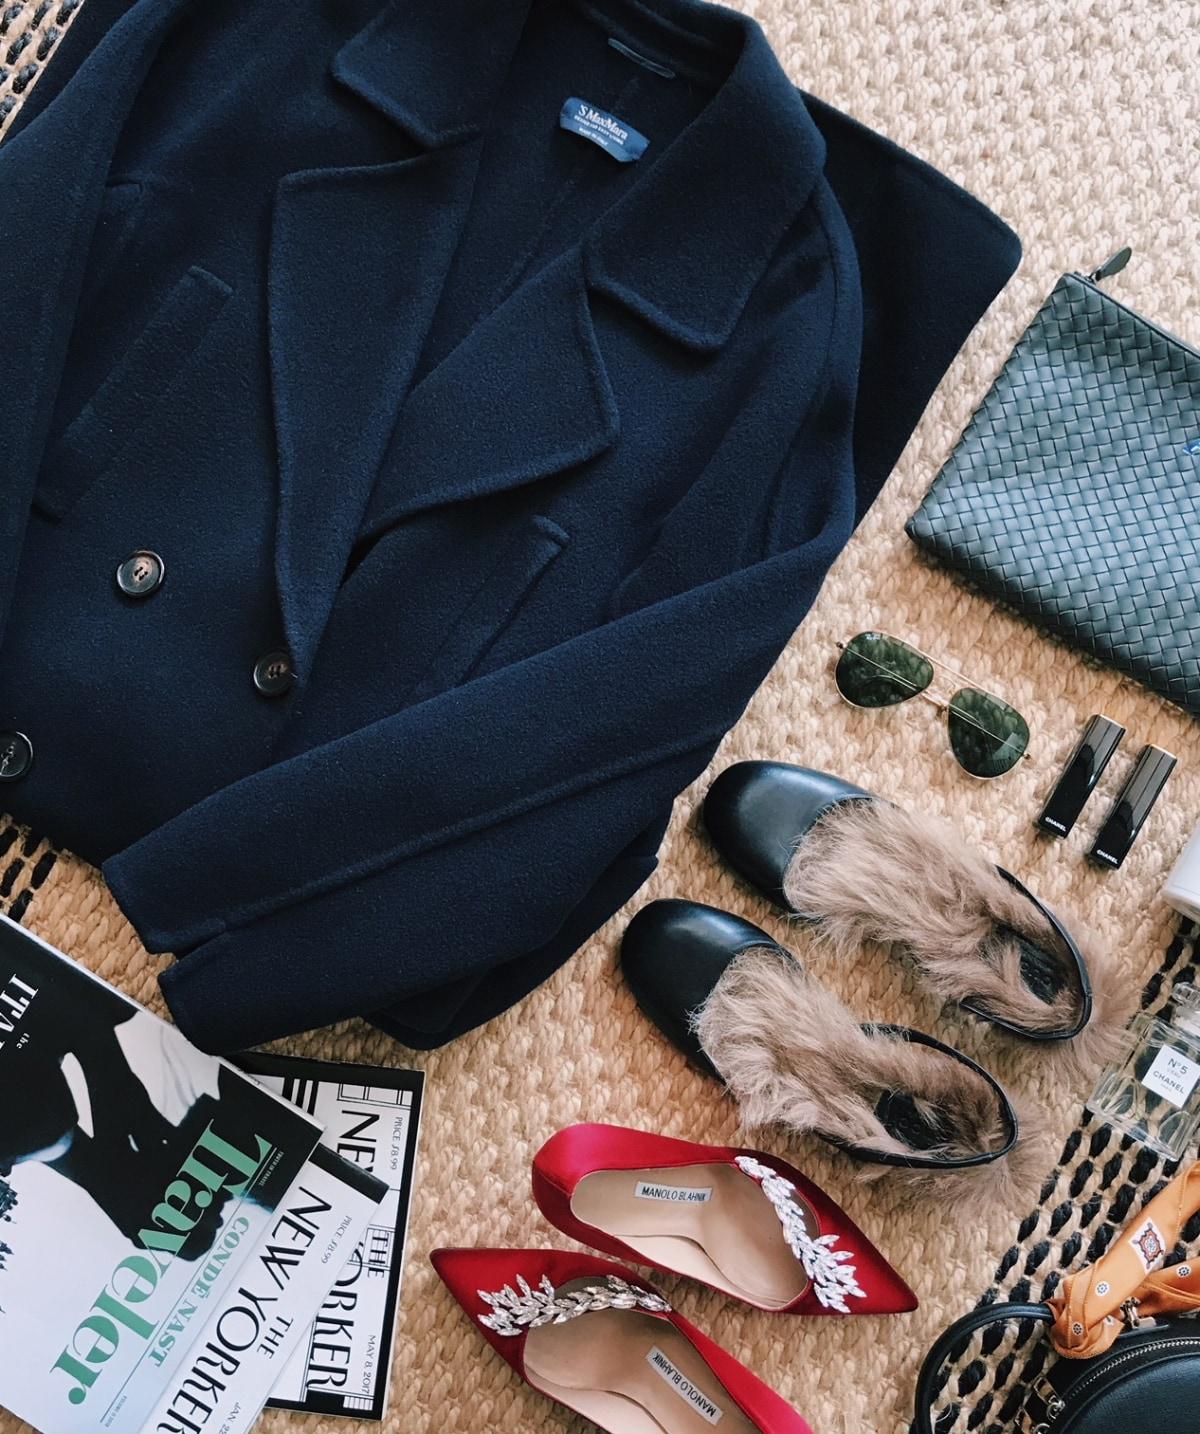 A Vogue editor's pre-fashion week ritual